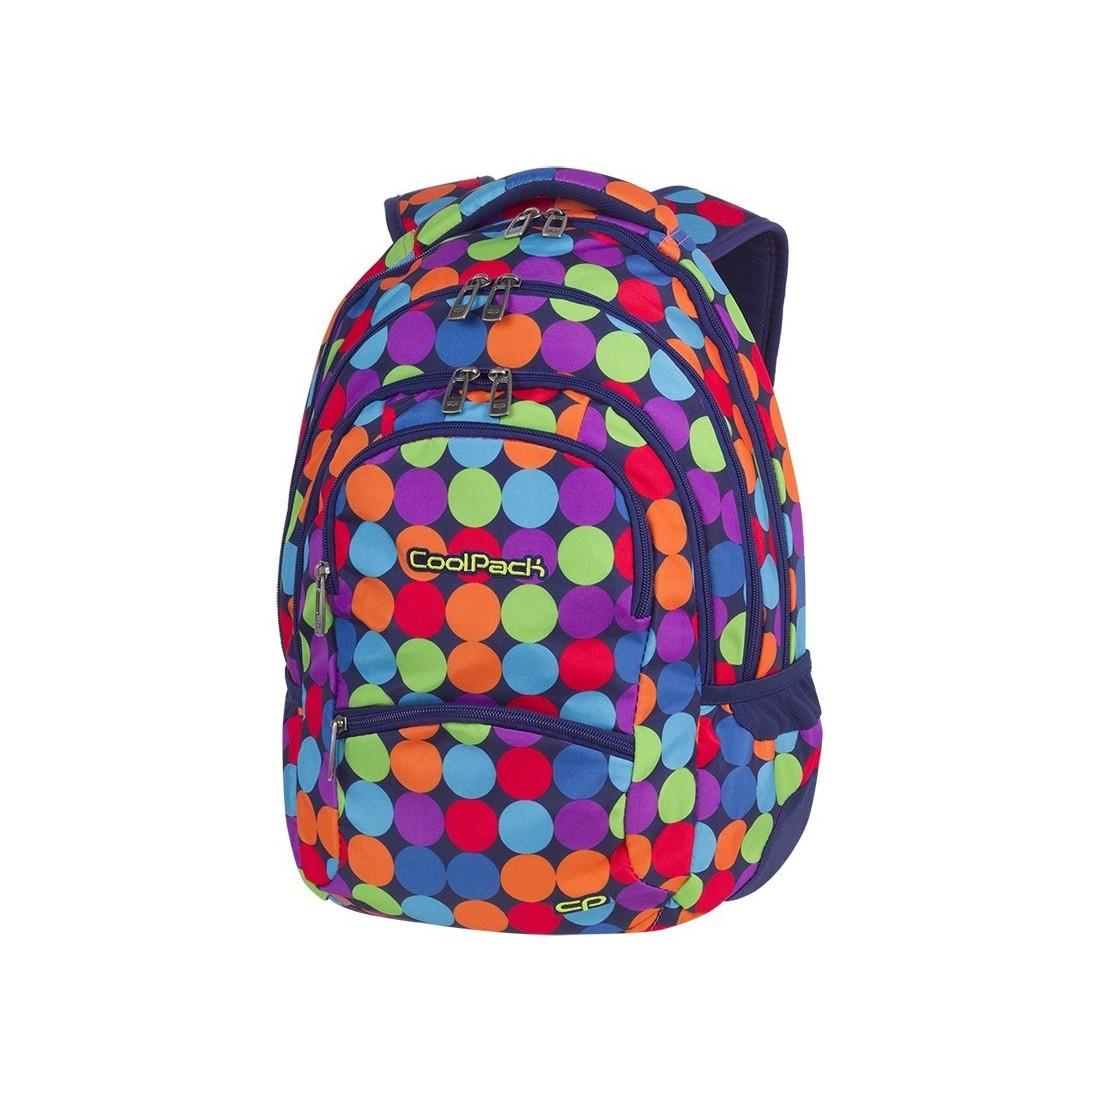 3658ab7ffc690 Plecak młodzieżowy CoolPack CP COLLEGE BUBBLE SHOOTER kolorowe kropki kulki  - 5 przegród - A490